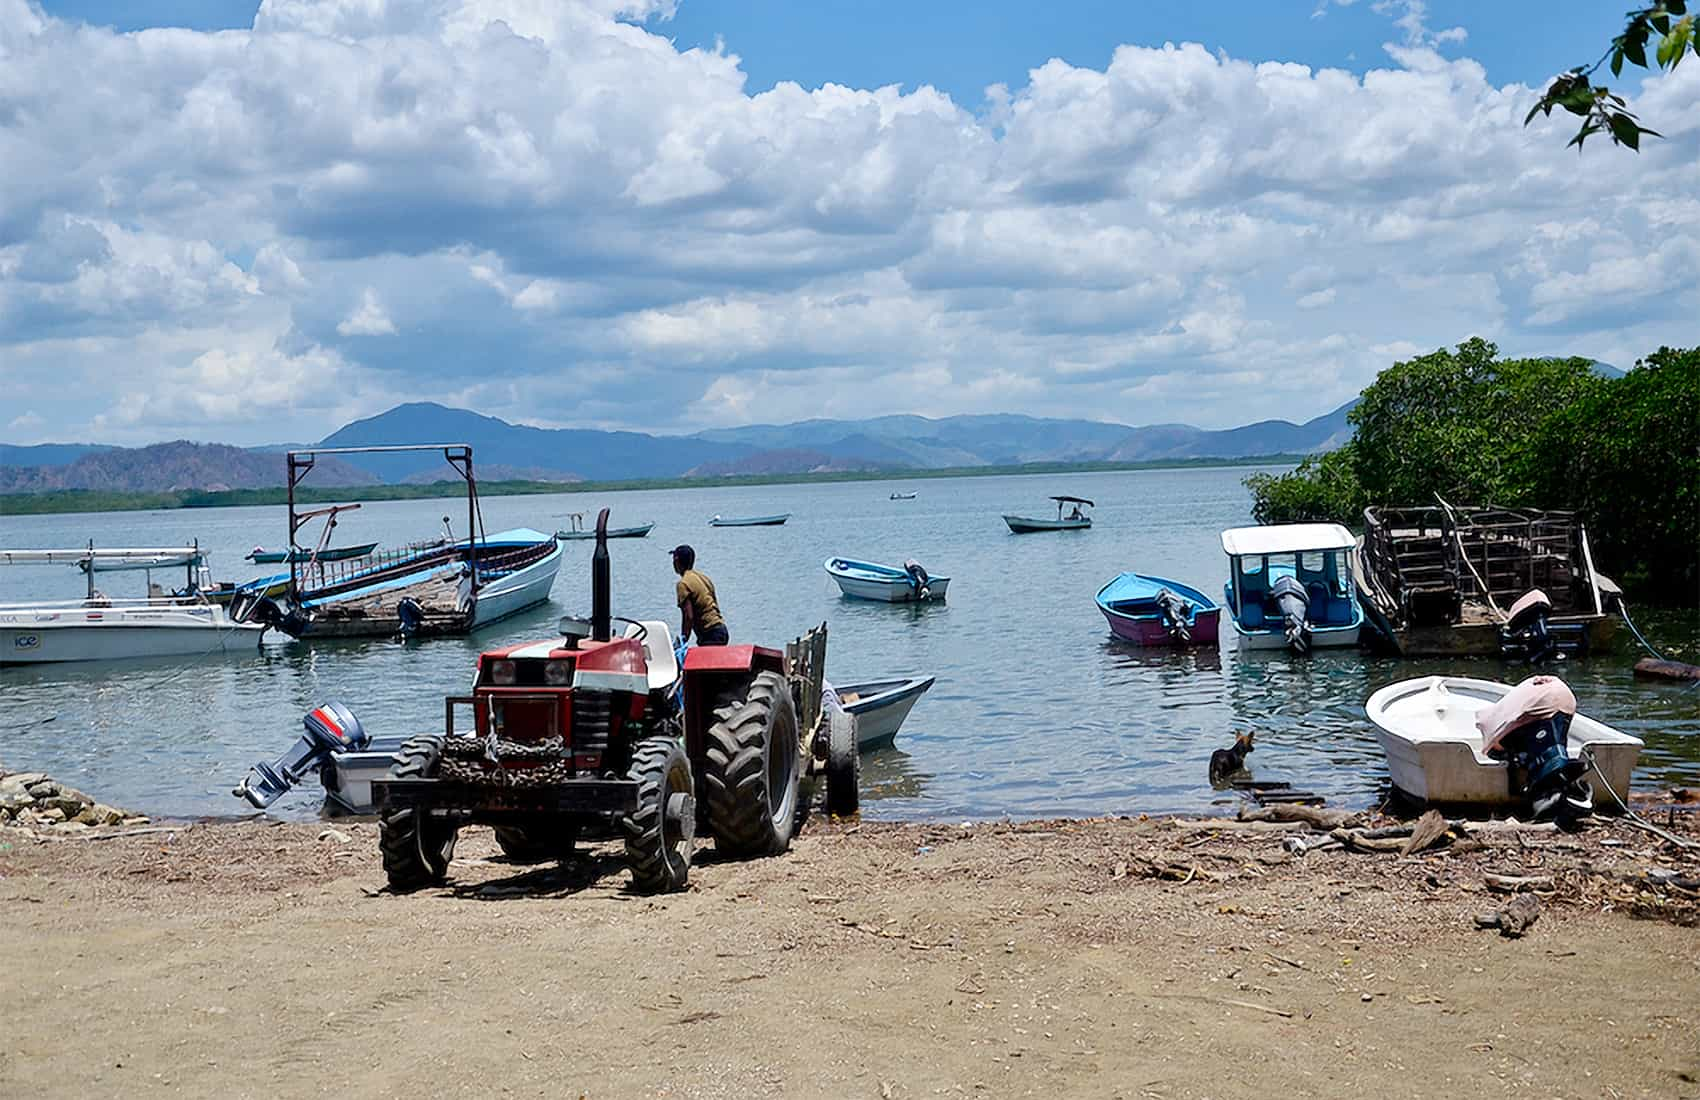 Artisanal fishers at Chira Island